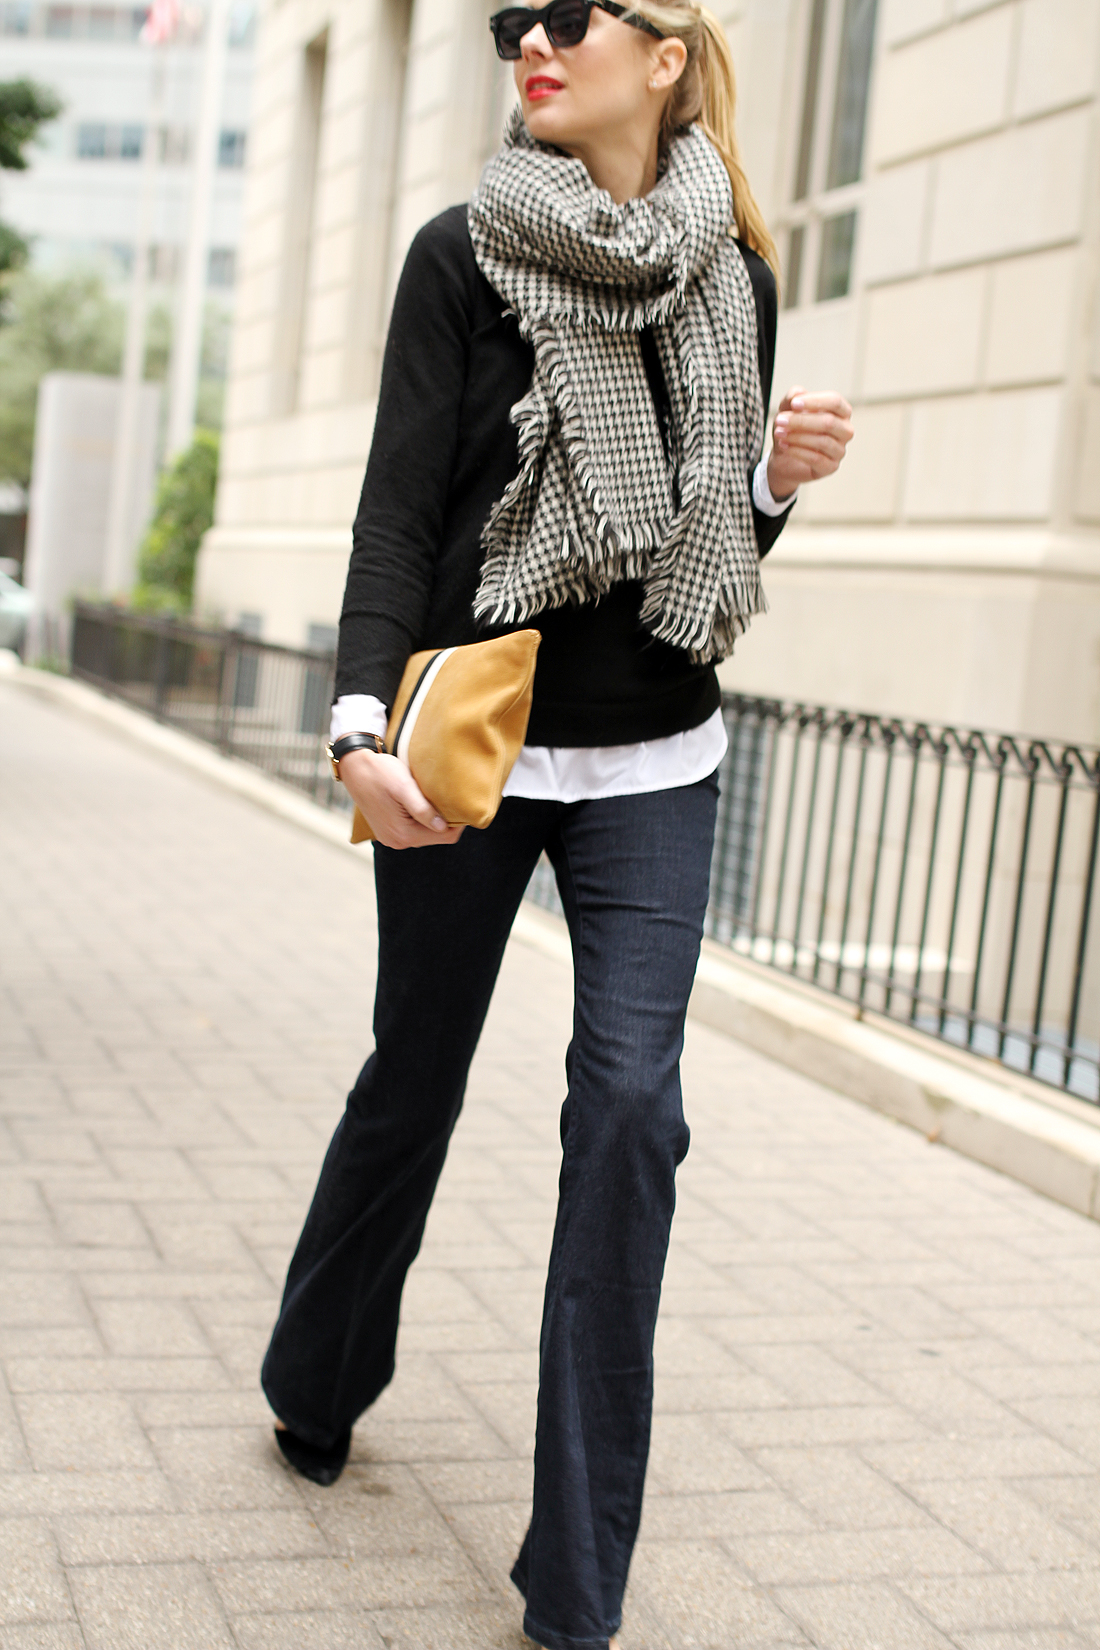 fashion-jackson-denim-flare-jeans-houndstooth-scarf-clare-v-clutch